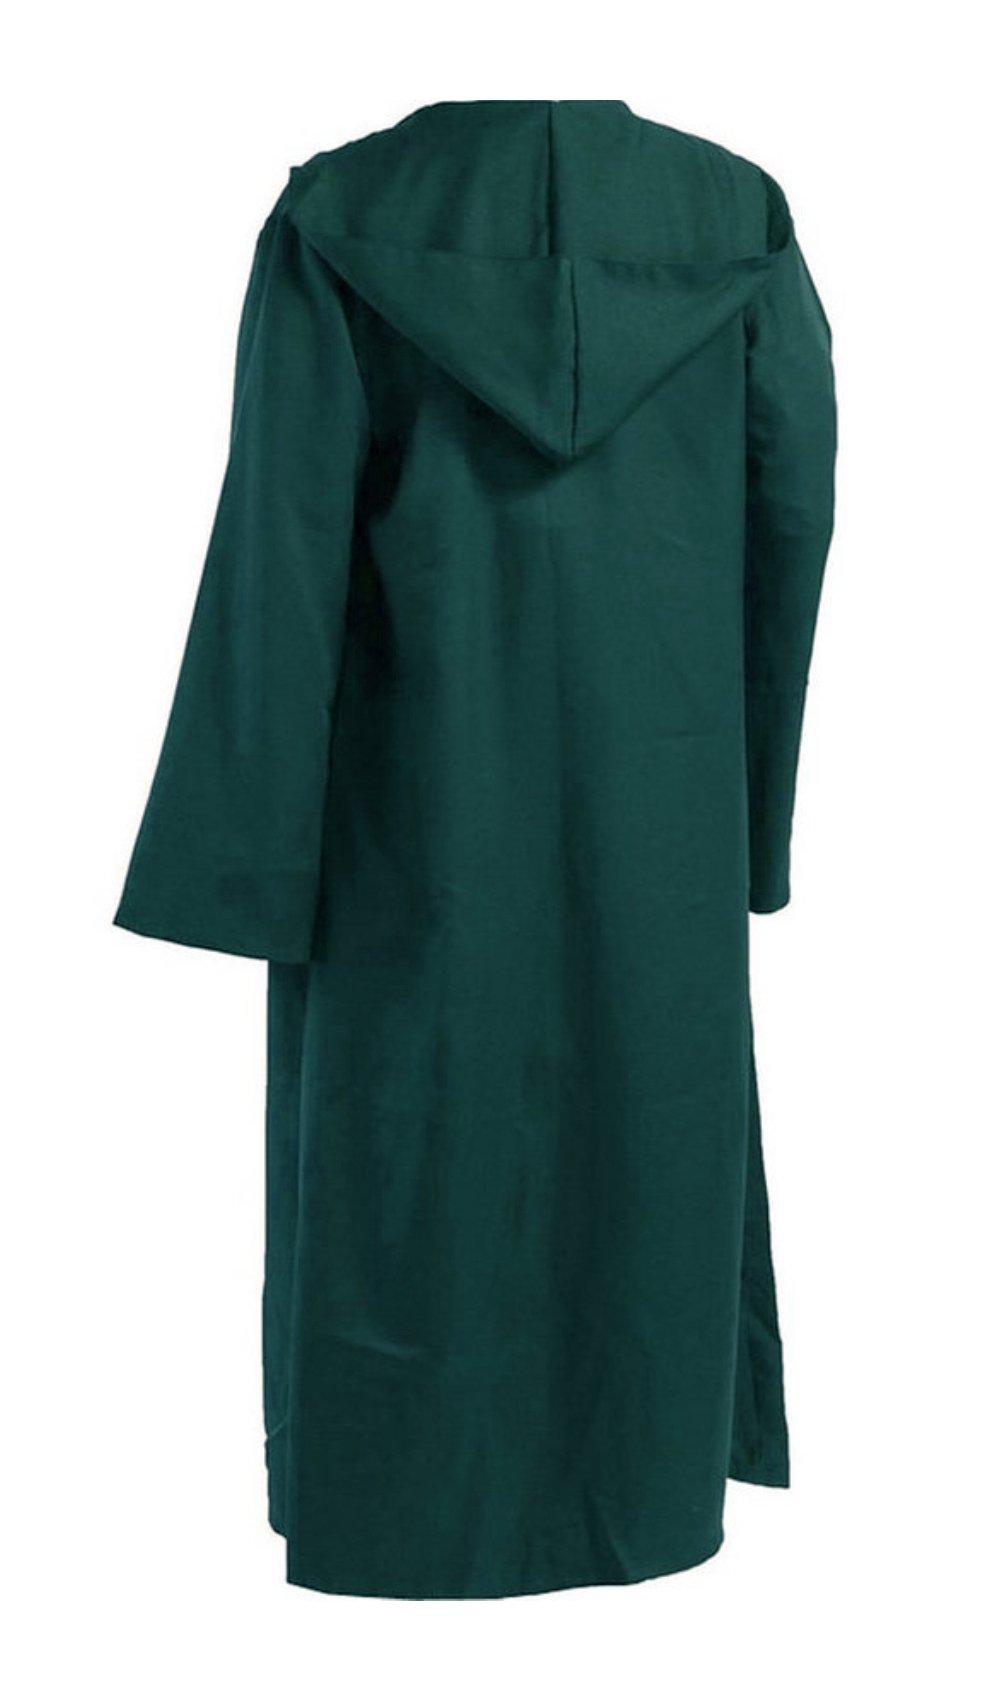 Men TUNIC Hooded Robe Cloak Knight Fancy Cool Cosplay Costume green M